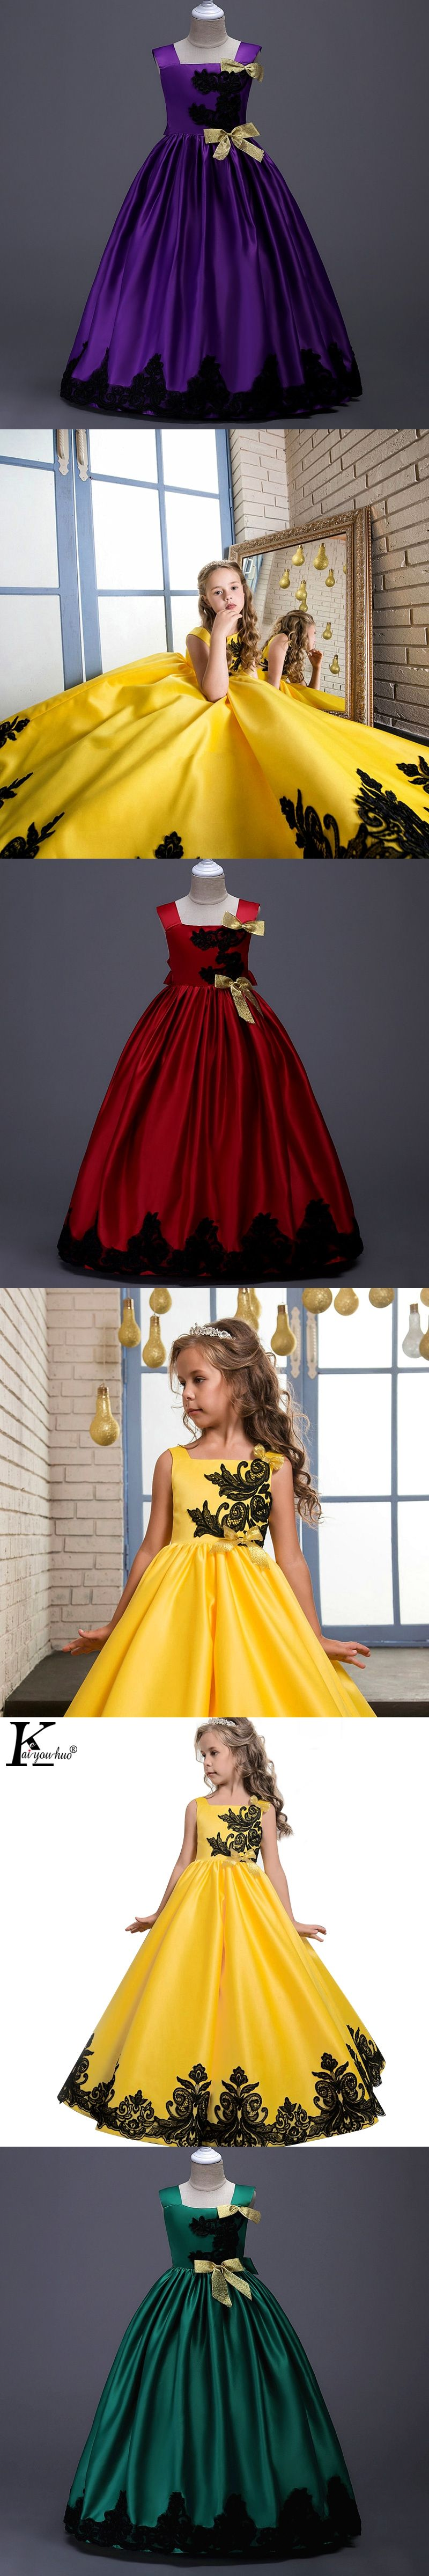 55fc30a87abd 2018 Girls Dress Carnava Kids Dresses For Girls Clothes Teenagers ...